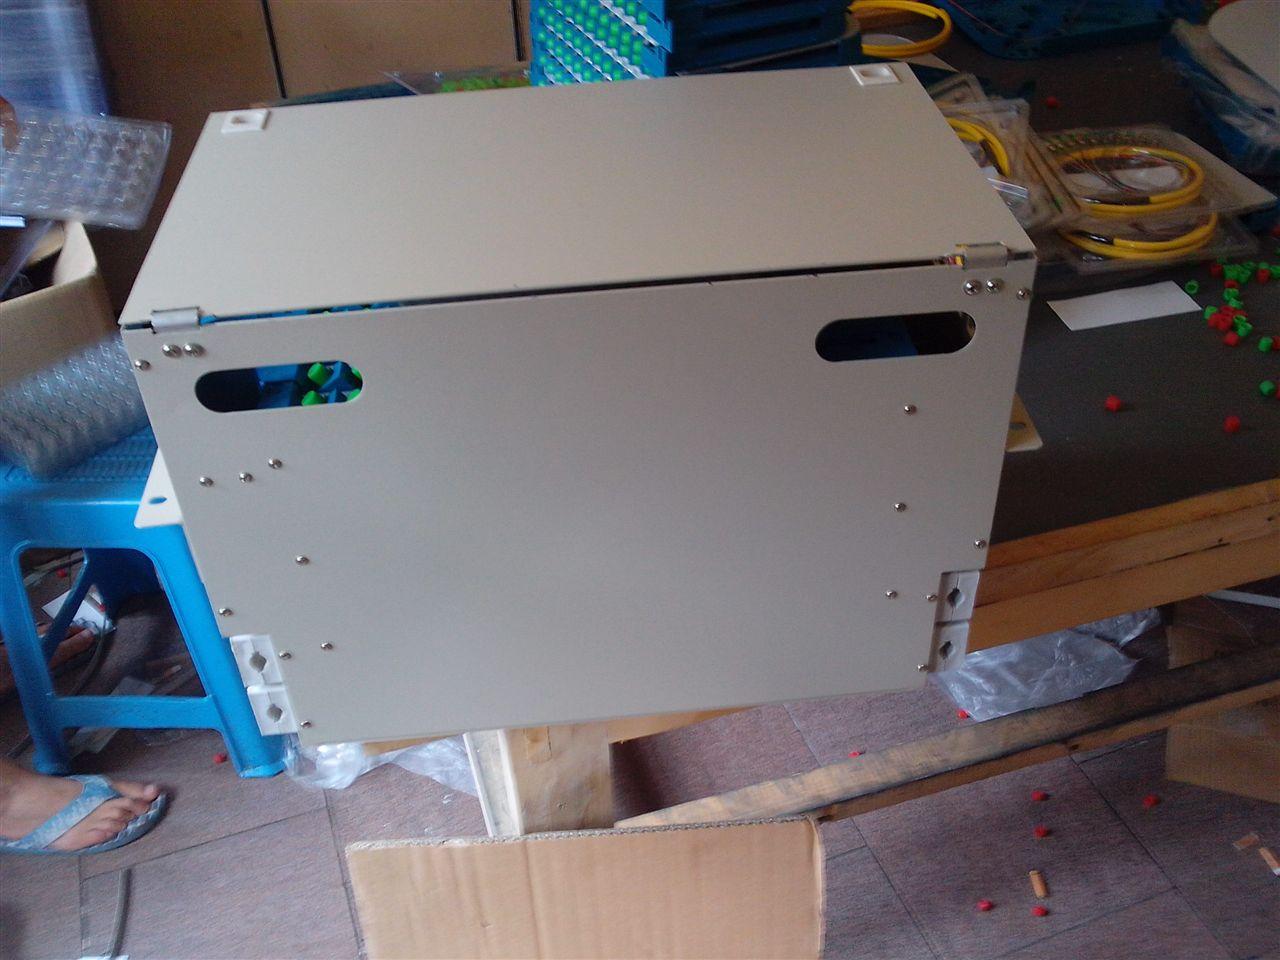 odf单元板,光纤配线子框 产品型号:zx-jpt001 产品规格:12芯,24芯,48